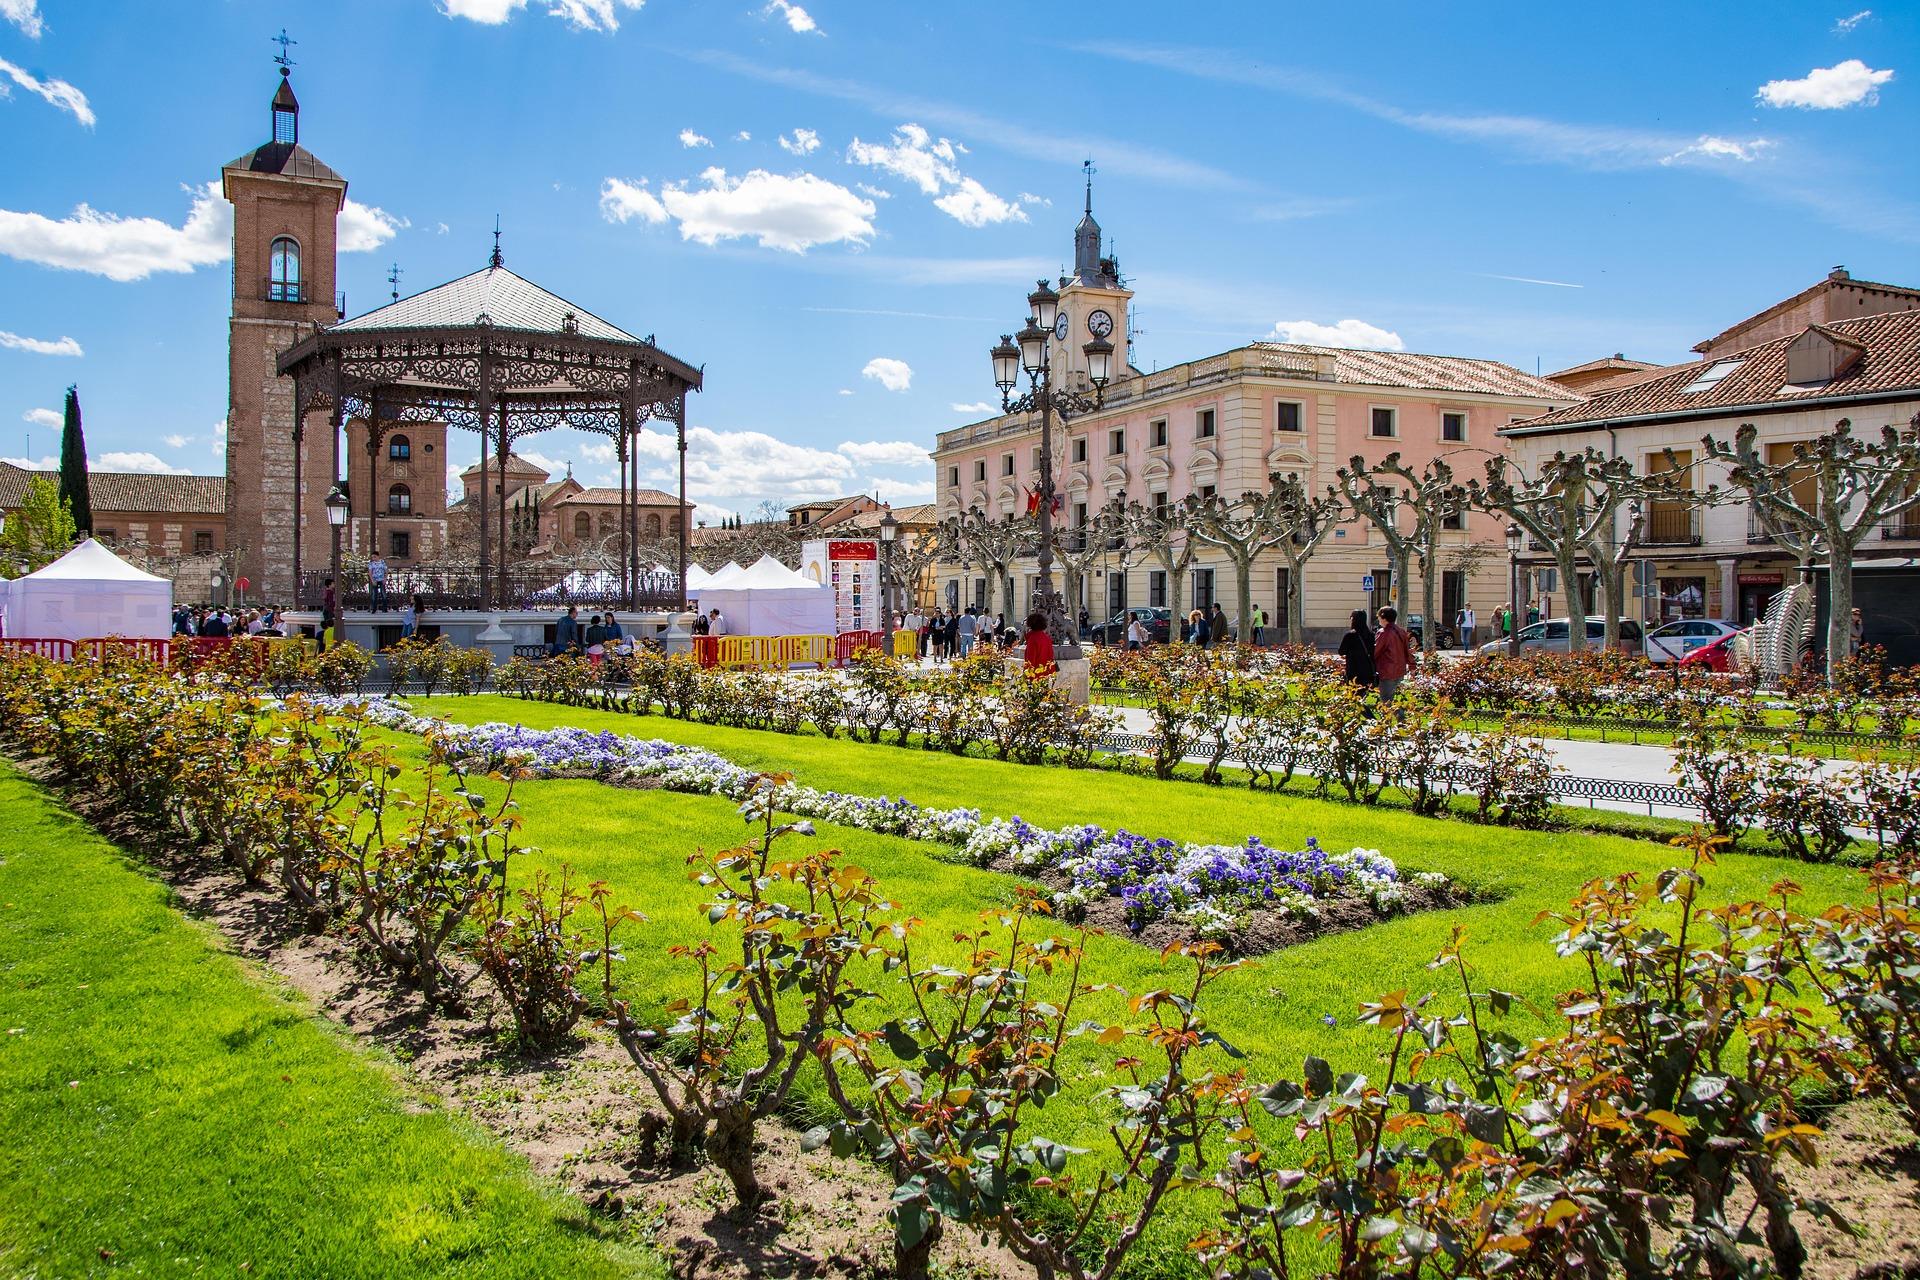 comparador de seguros en Alcalá de Henares